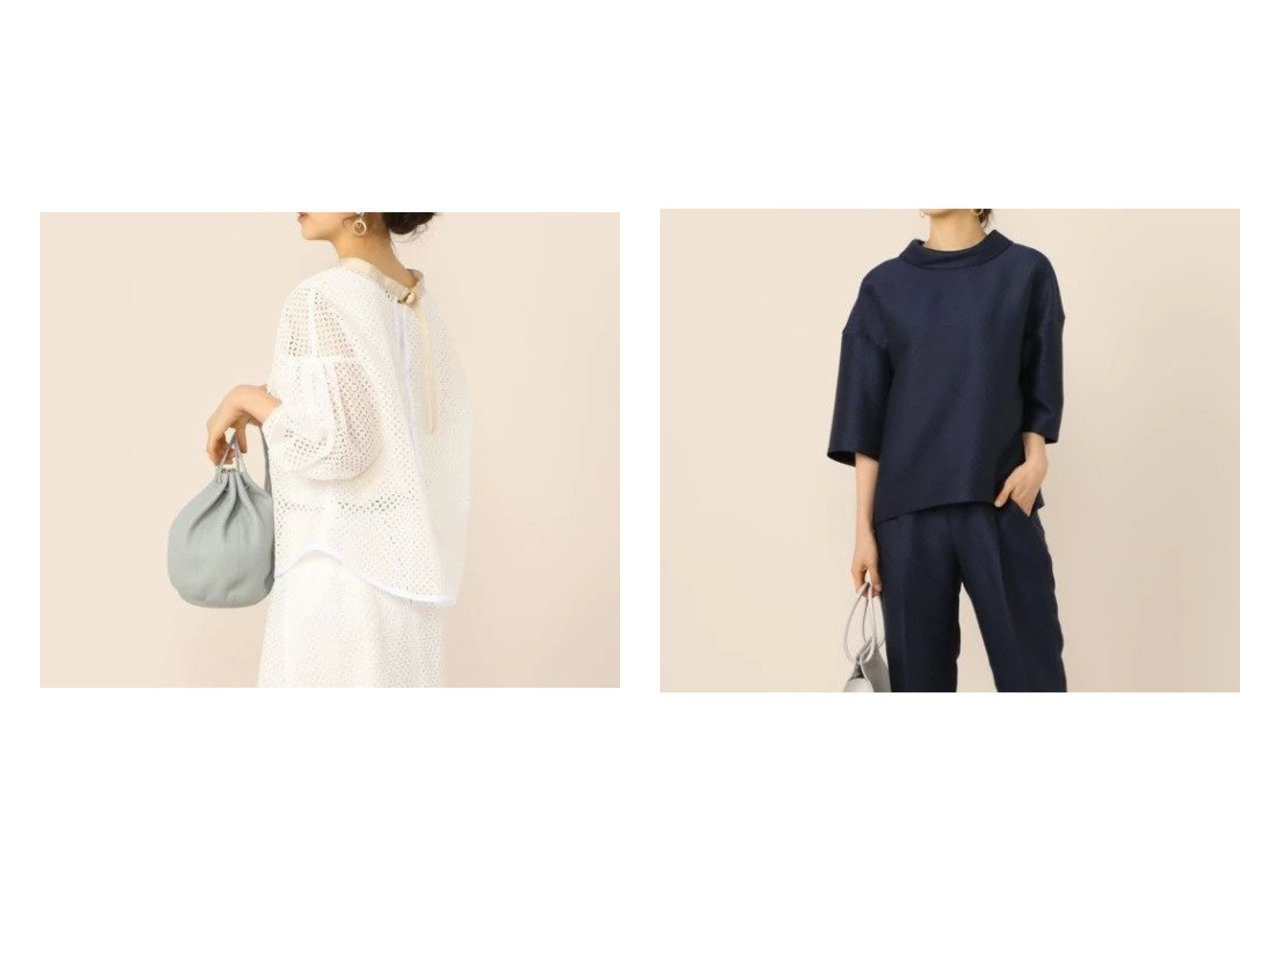 【NOLLEY'S/ノーリーズ】のスクエア刺繍 両前羽織ブラウス&ドットジャガード両前ロールネックプルオーバーブラウス 【トップス・カットソー】おすすめ!人気、トレンド・レディースファッションの通販 | レディースファッション・服の通販 founy(ファニー)